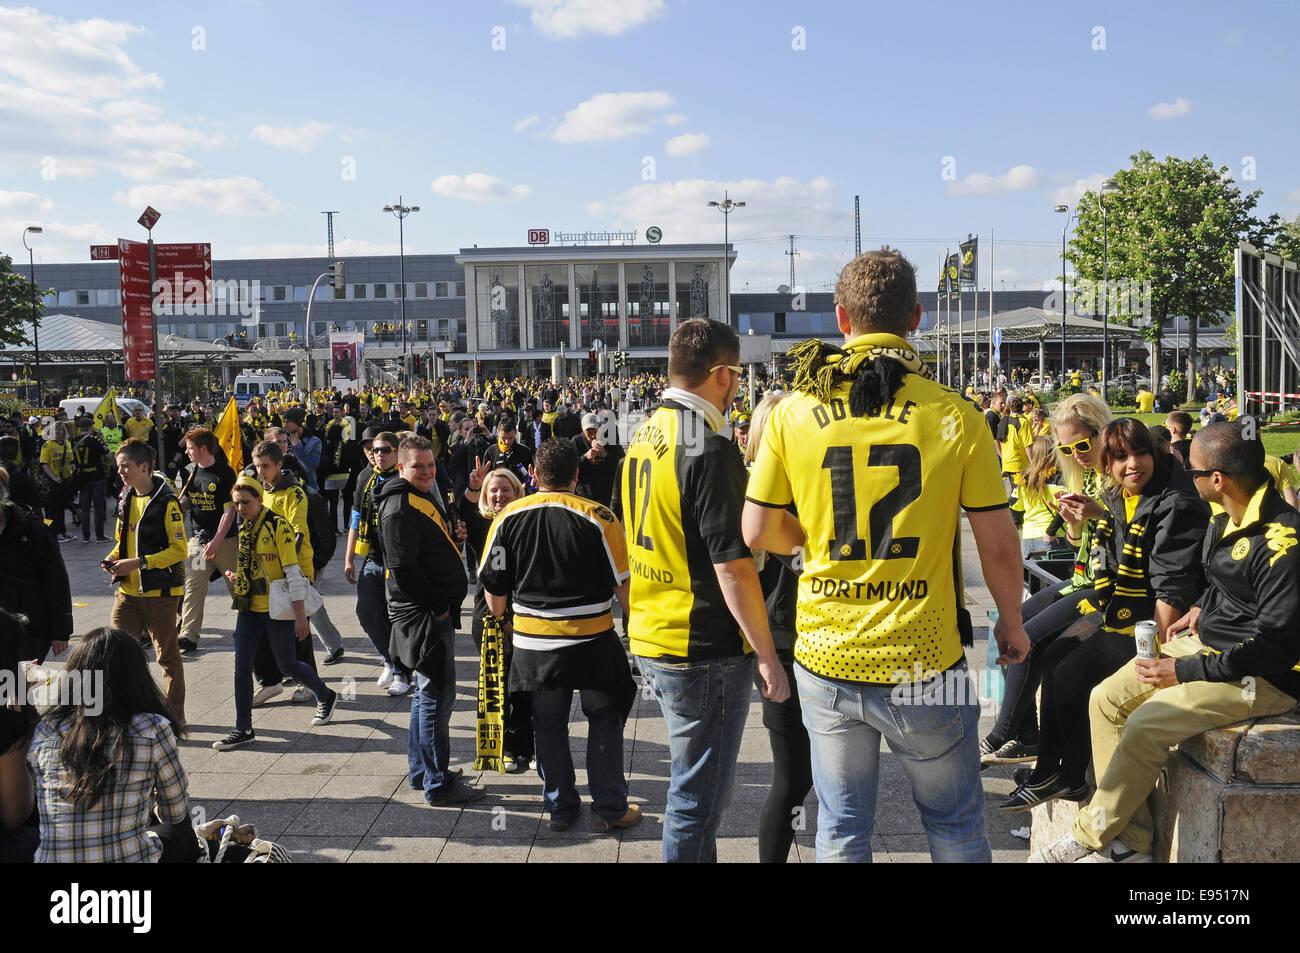 football club BVB, fans, Dortmund, Germany - Stock Image